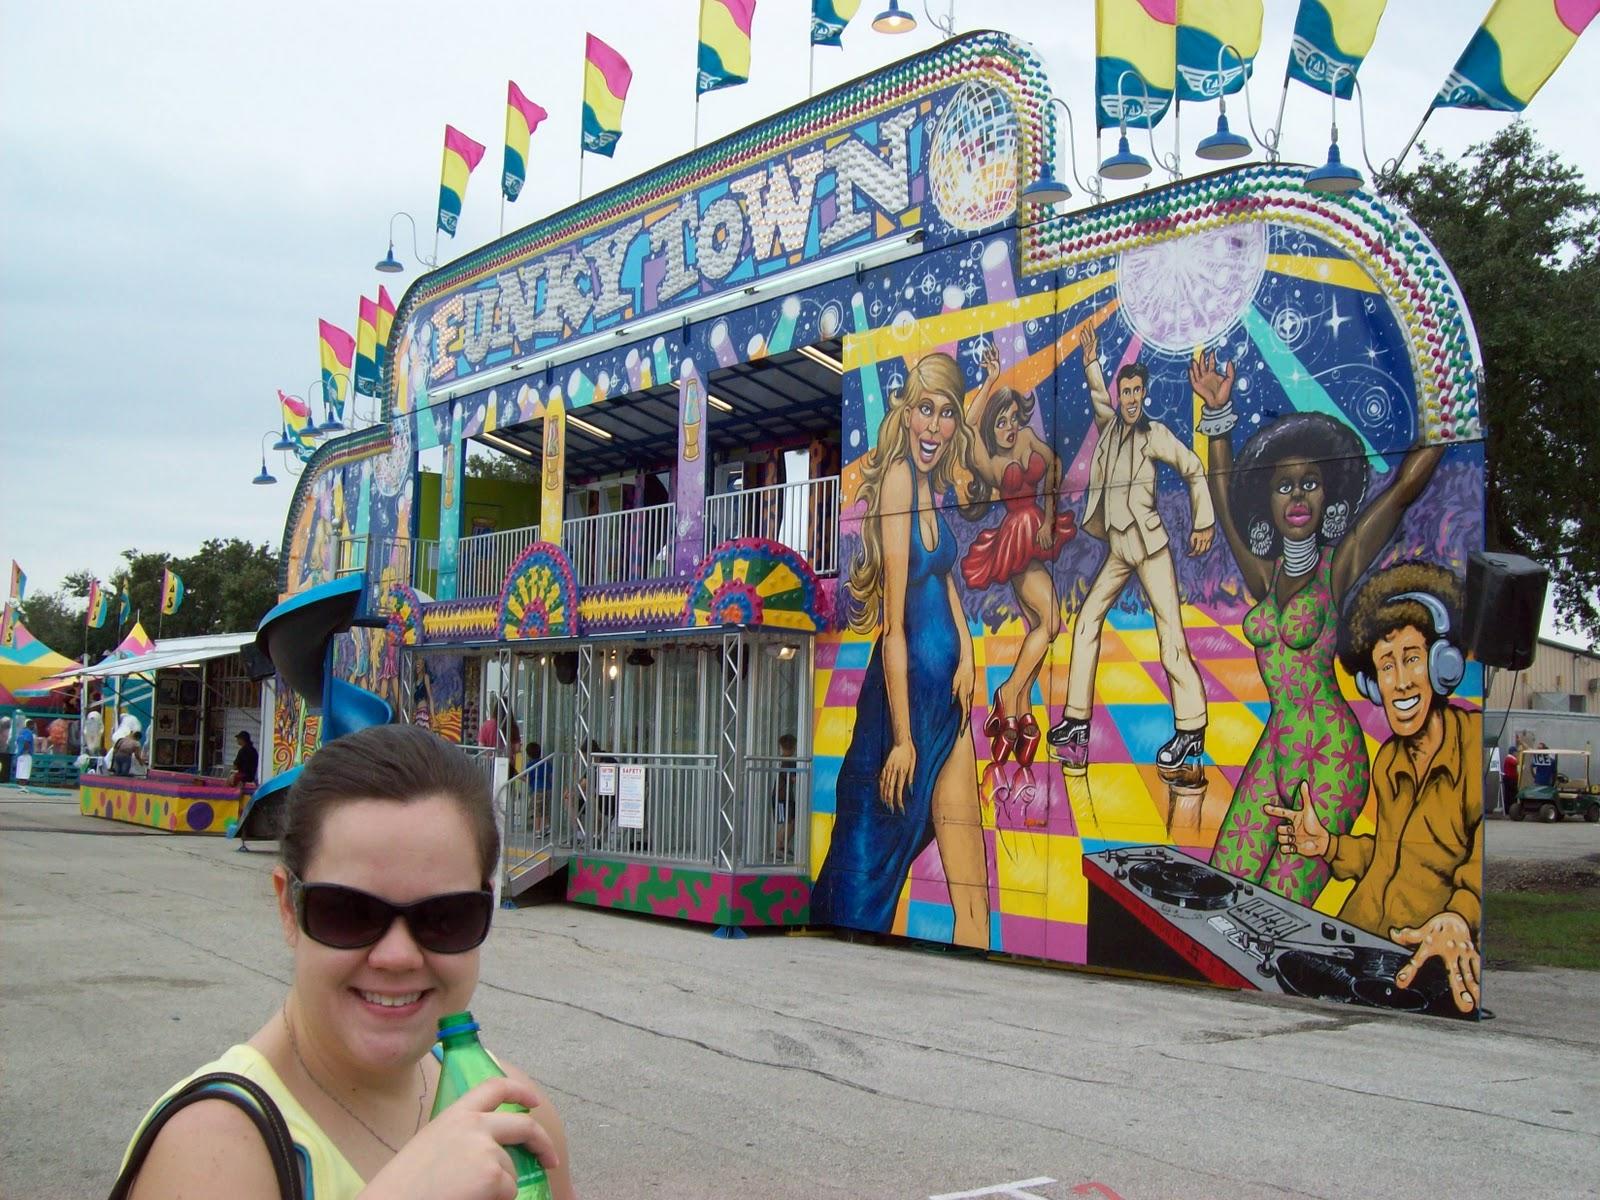 Fort Bend County Fair - 101_5582.JPG